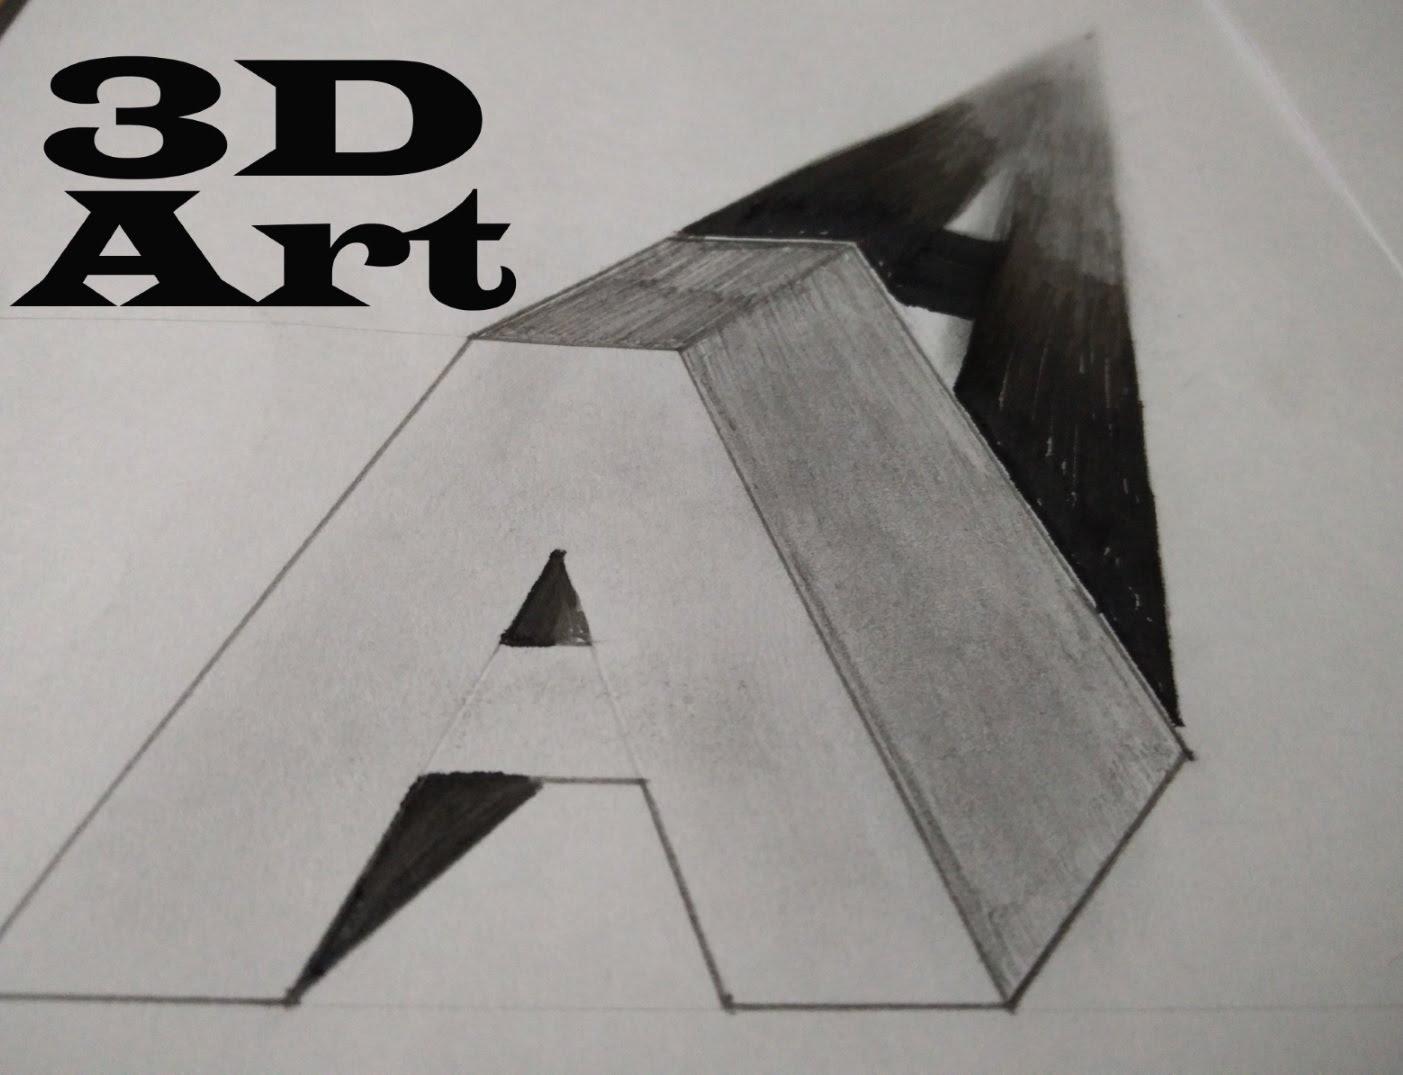 3d-sketch-art